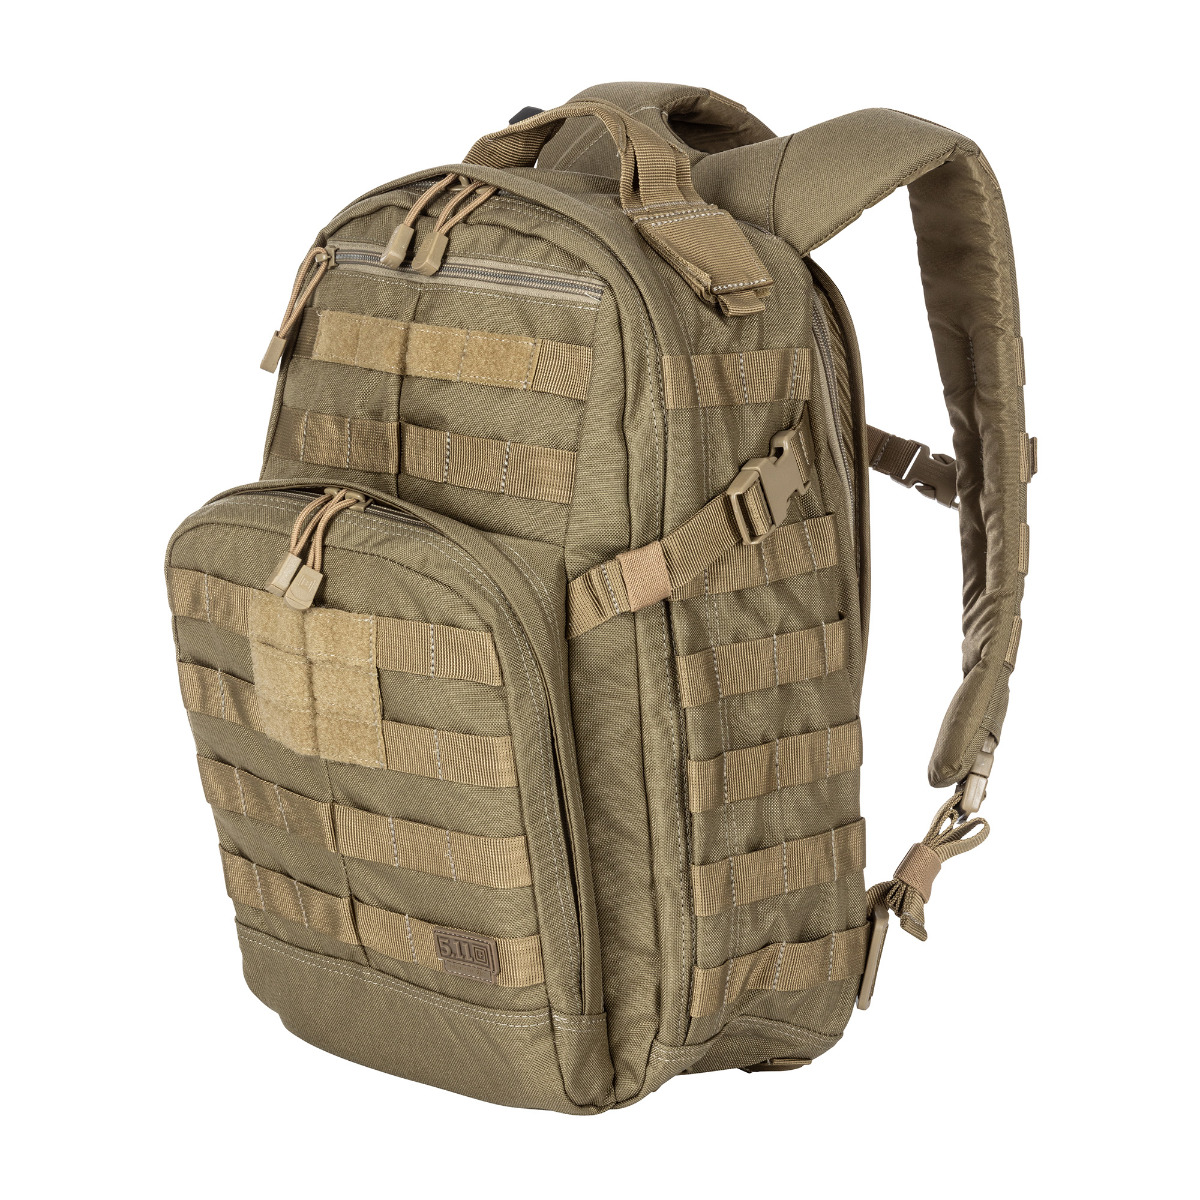 5.11 Tactical RUSH12™ Backpack (Khaki/Tan)